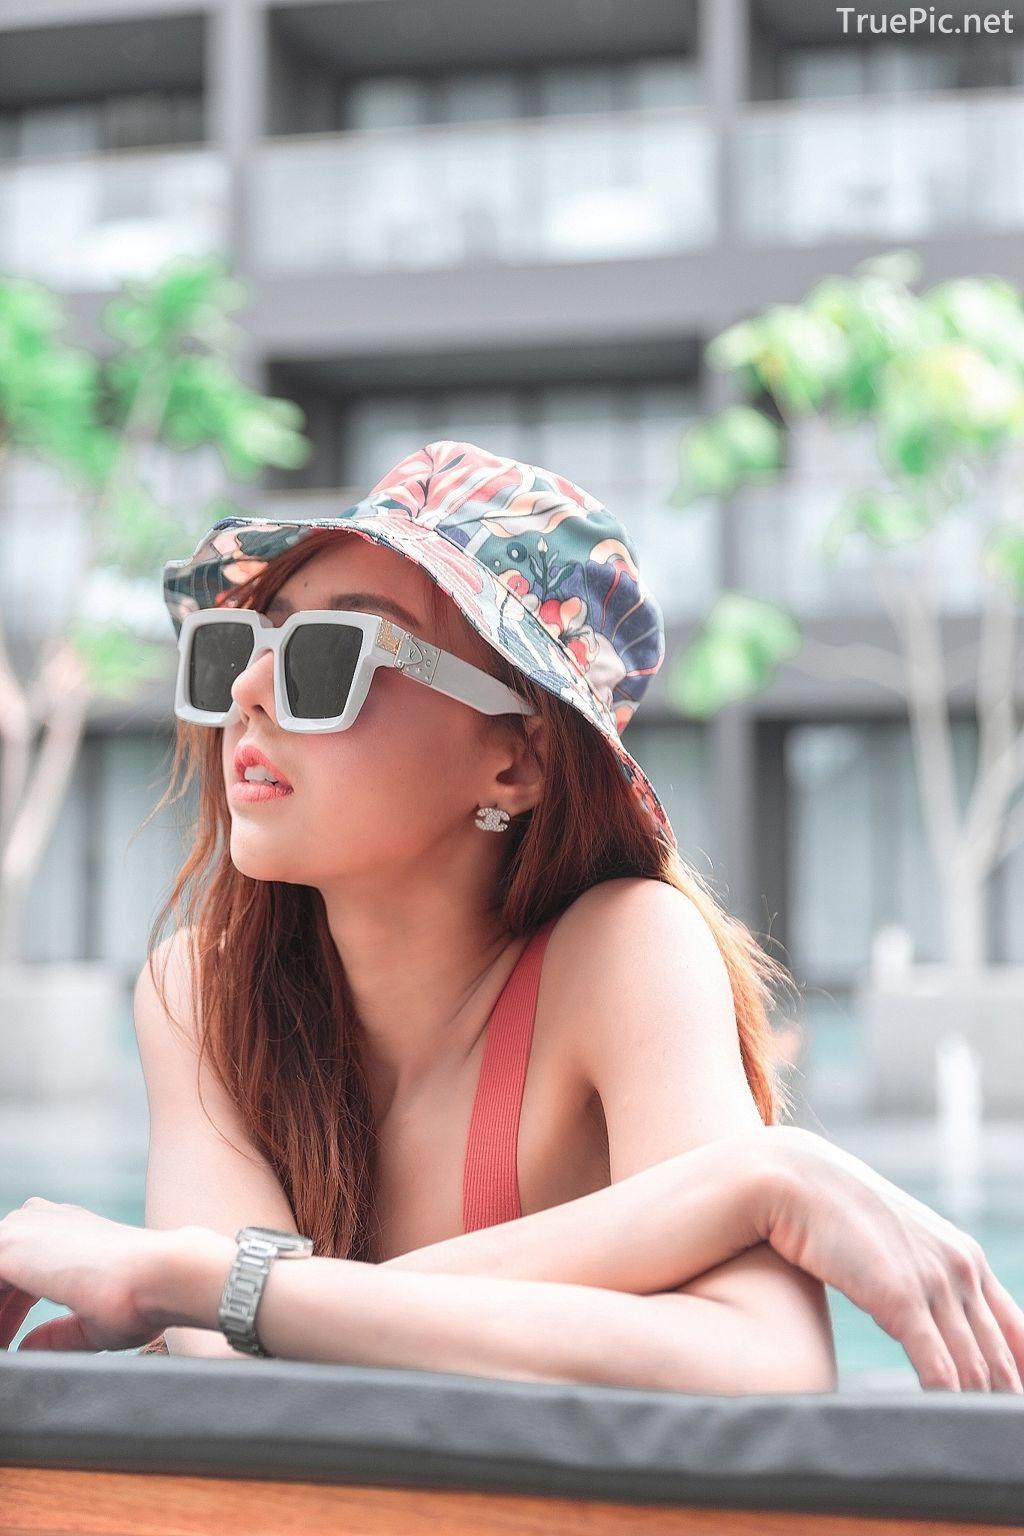 Thailand model - I'nam Arissara Chaidech - Pink Bikini on the beach - TruePic.net - Picture 7